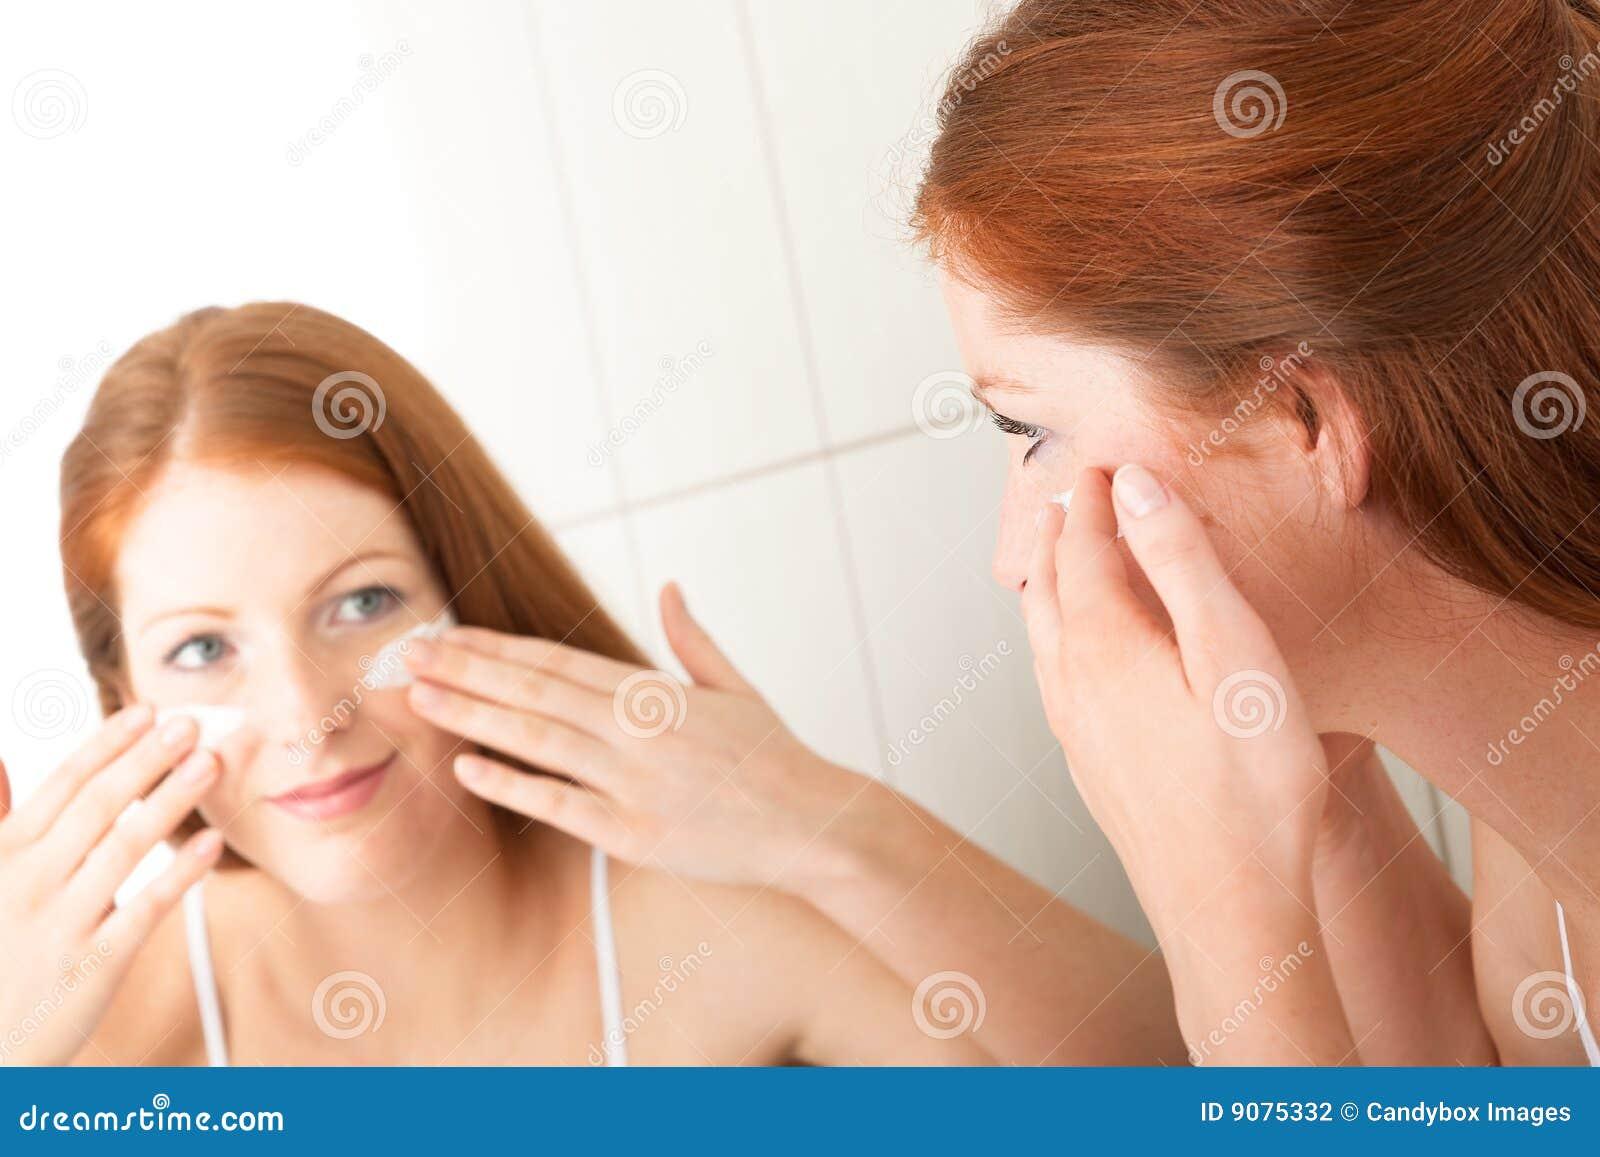 Karosseriensorgfaltserie - Frau, die Sahne aufträgt